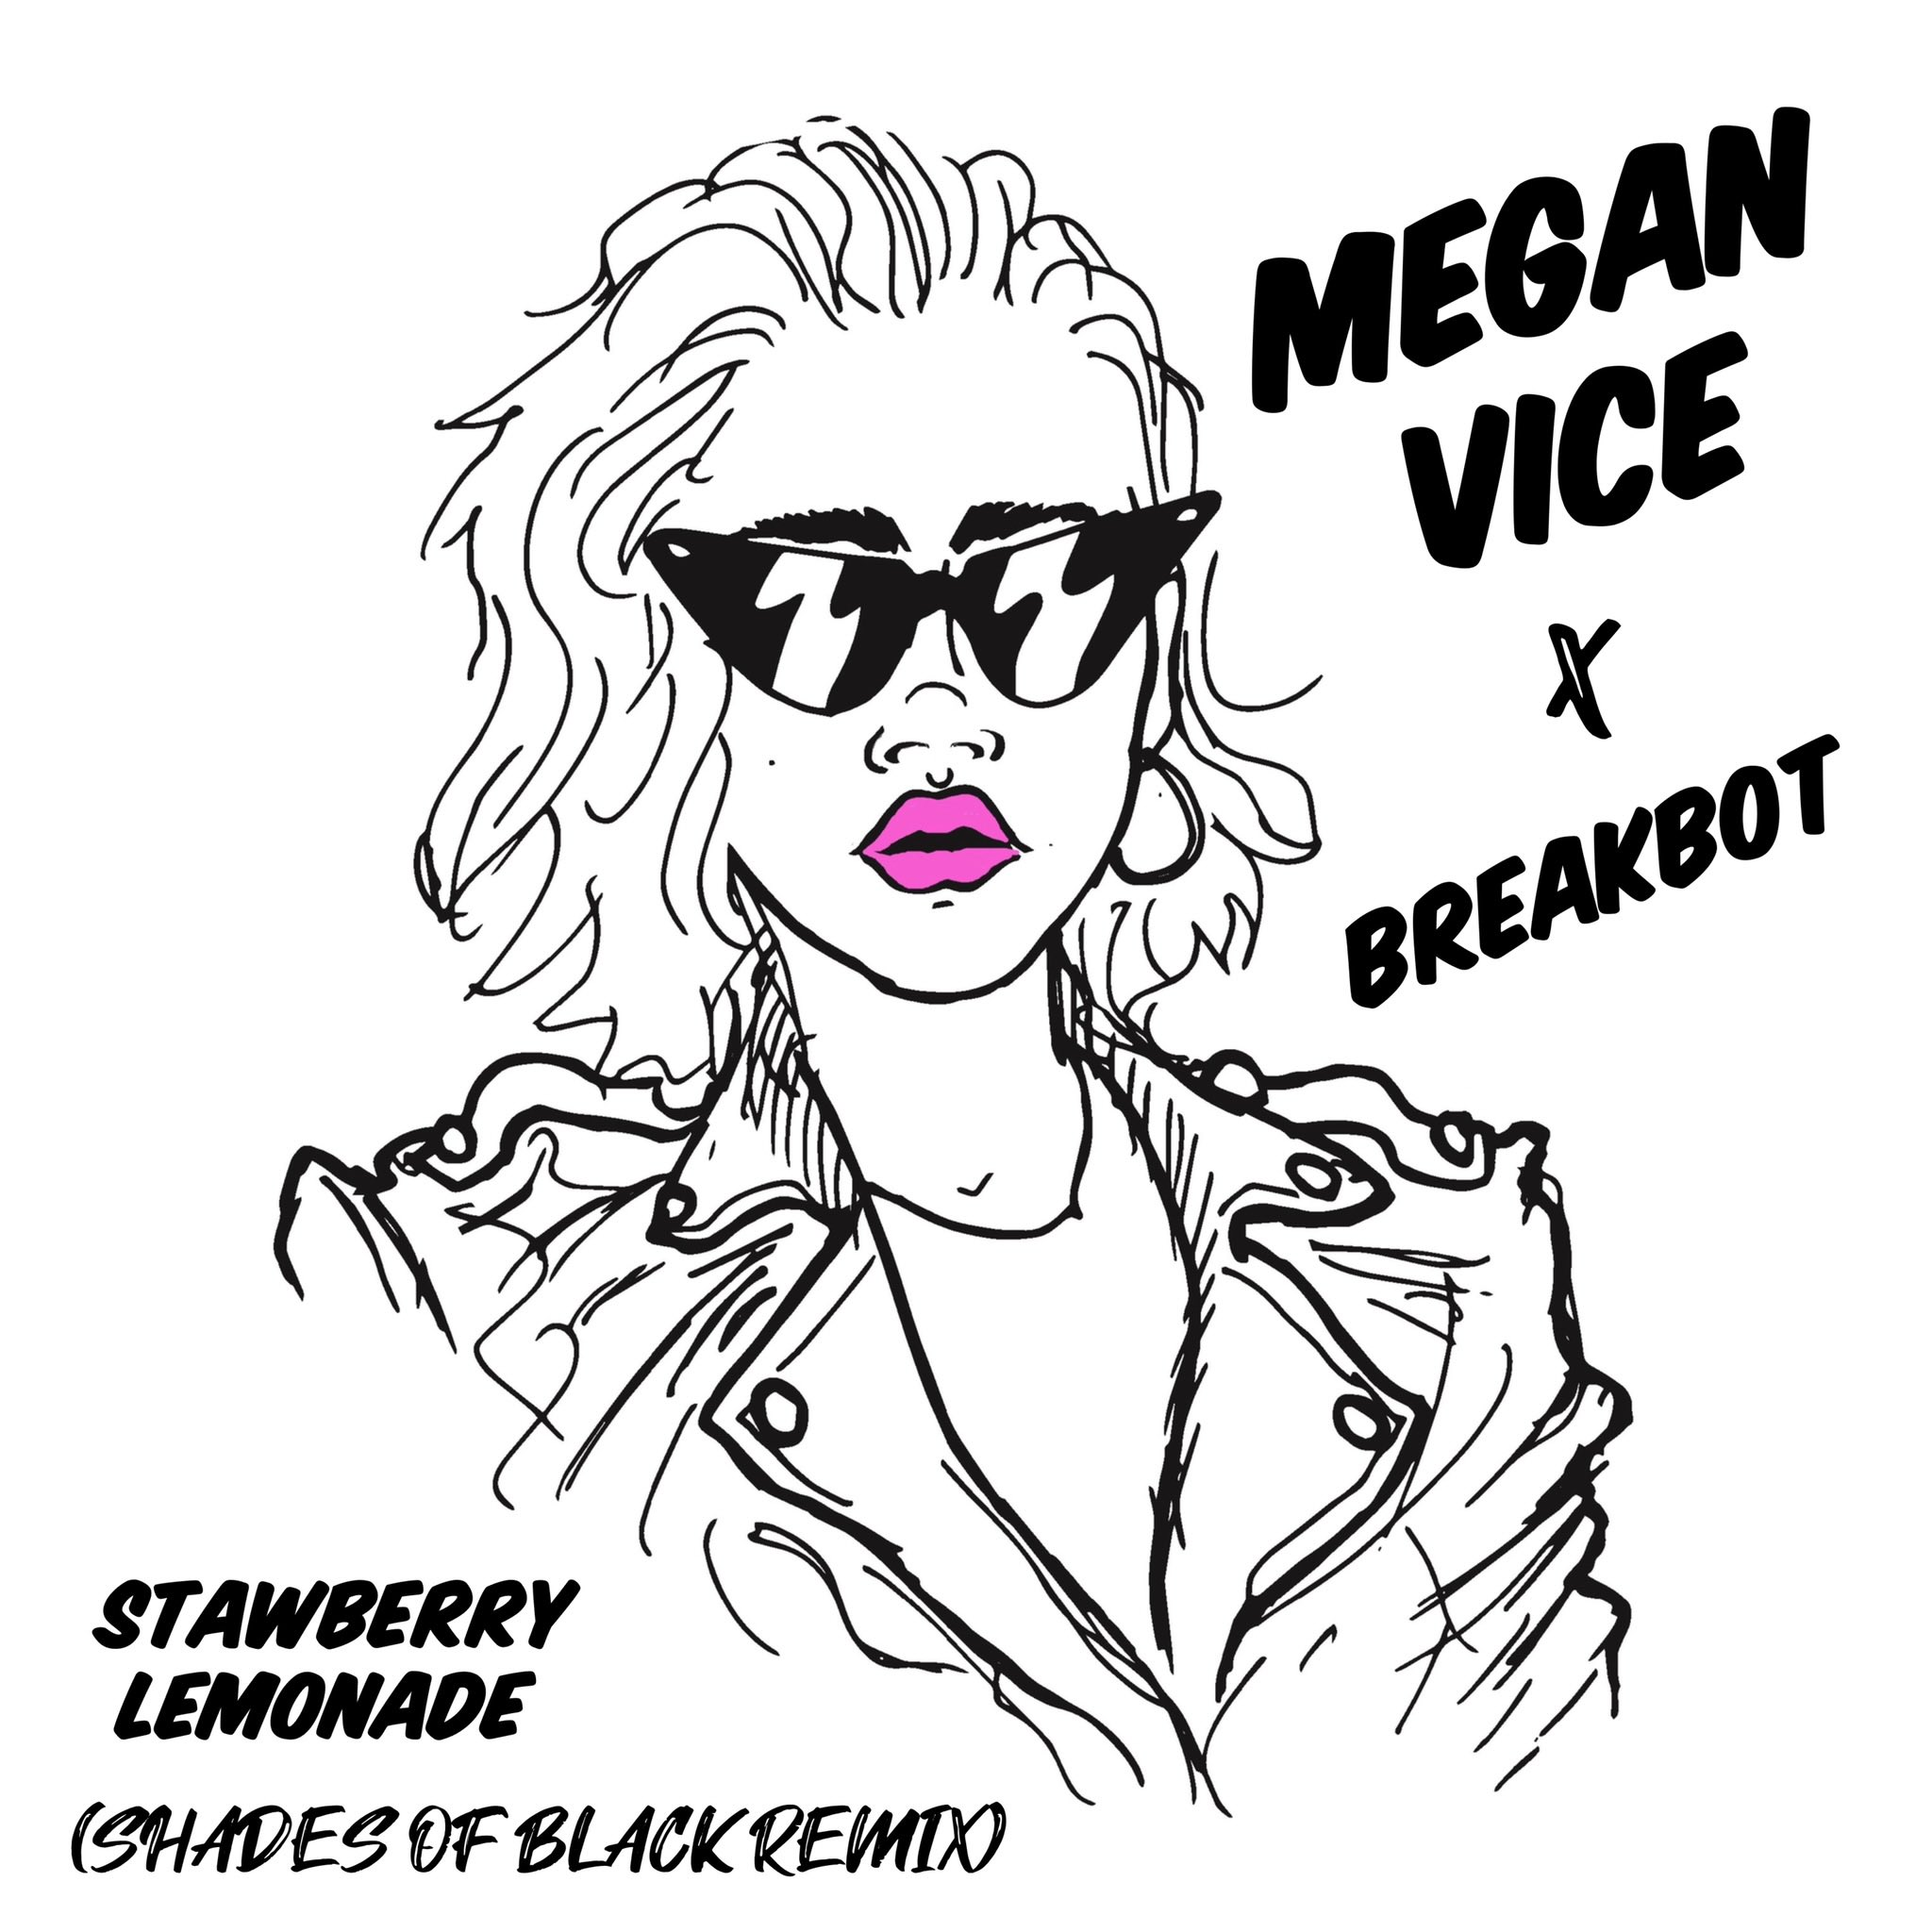 Listen Now: Megan Vice - Strawberry Lemonade (Shades of Black Remix)